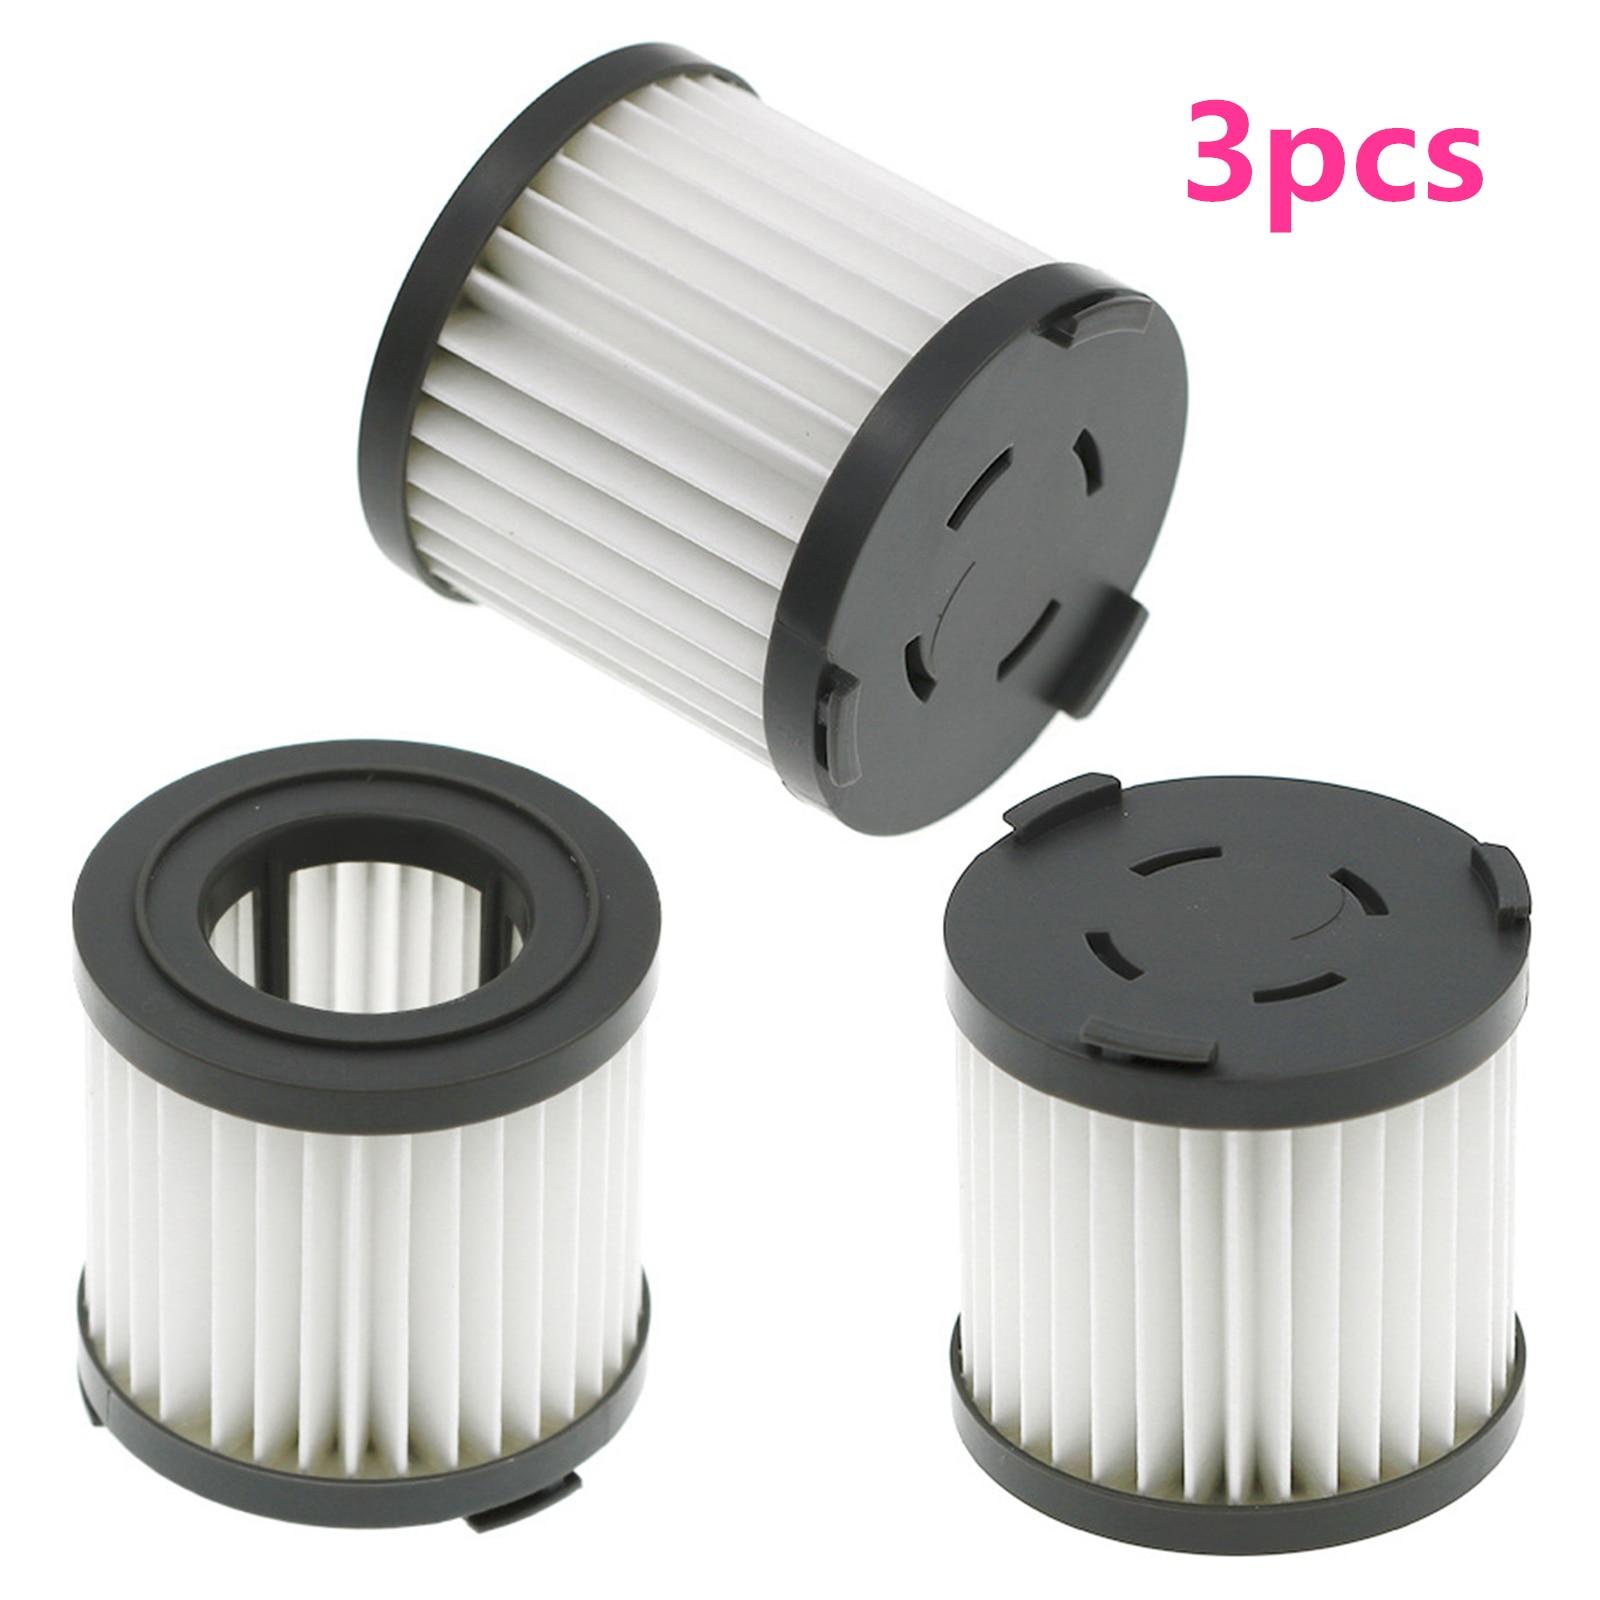 3pcs Original HEPA Filter JV51 CJ53 C53T CP31 Filters for Xiaomi JIMMY JV51 Handheld Cordless Vacuum Cleaner Parts Accessories